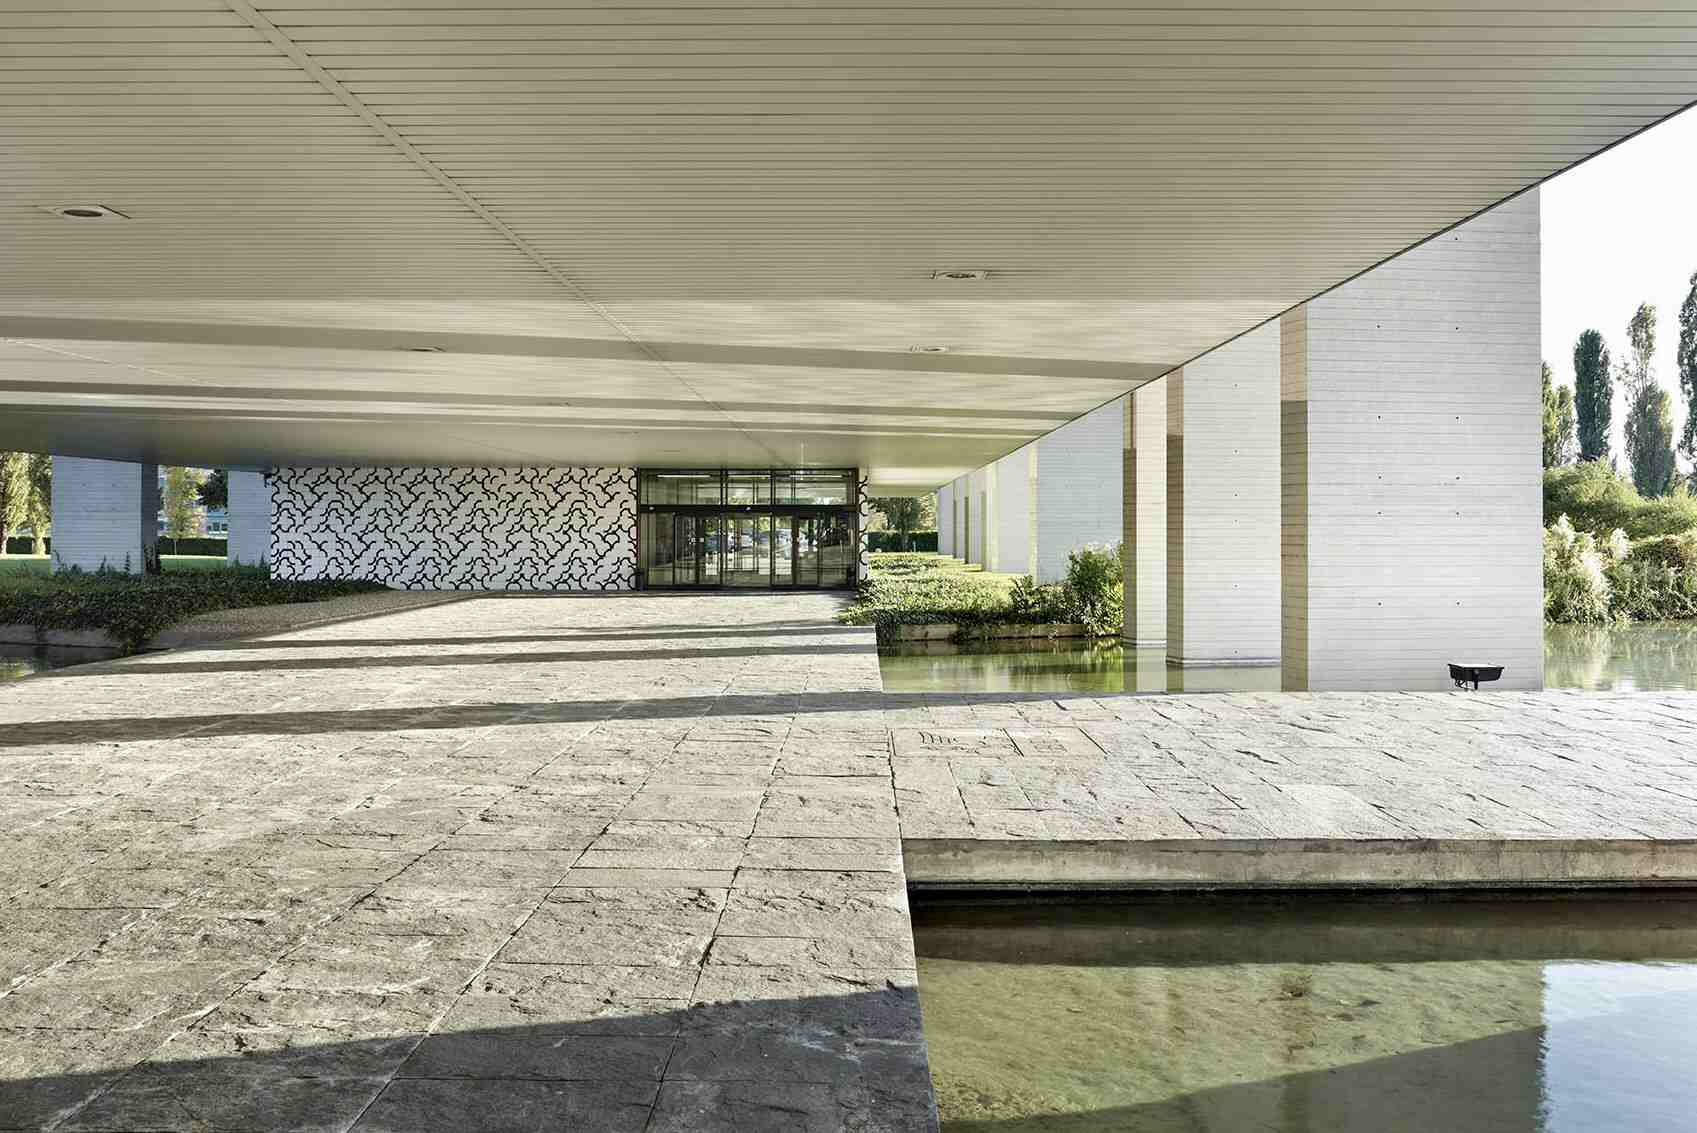 Terrace of Palazzo Mondadori in Segrate, Milan, Italy, designed by Oscar Niemeyer